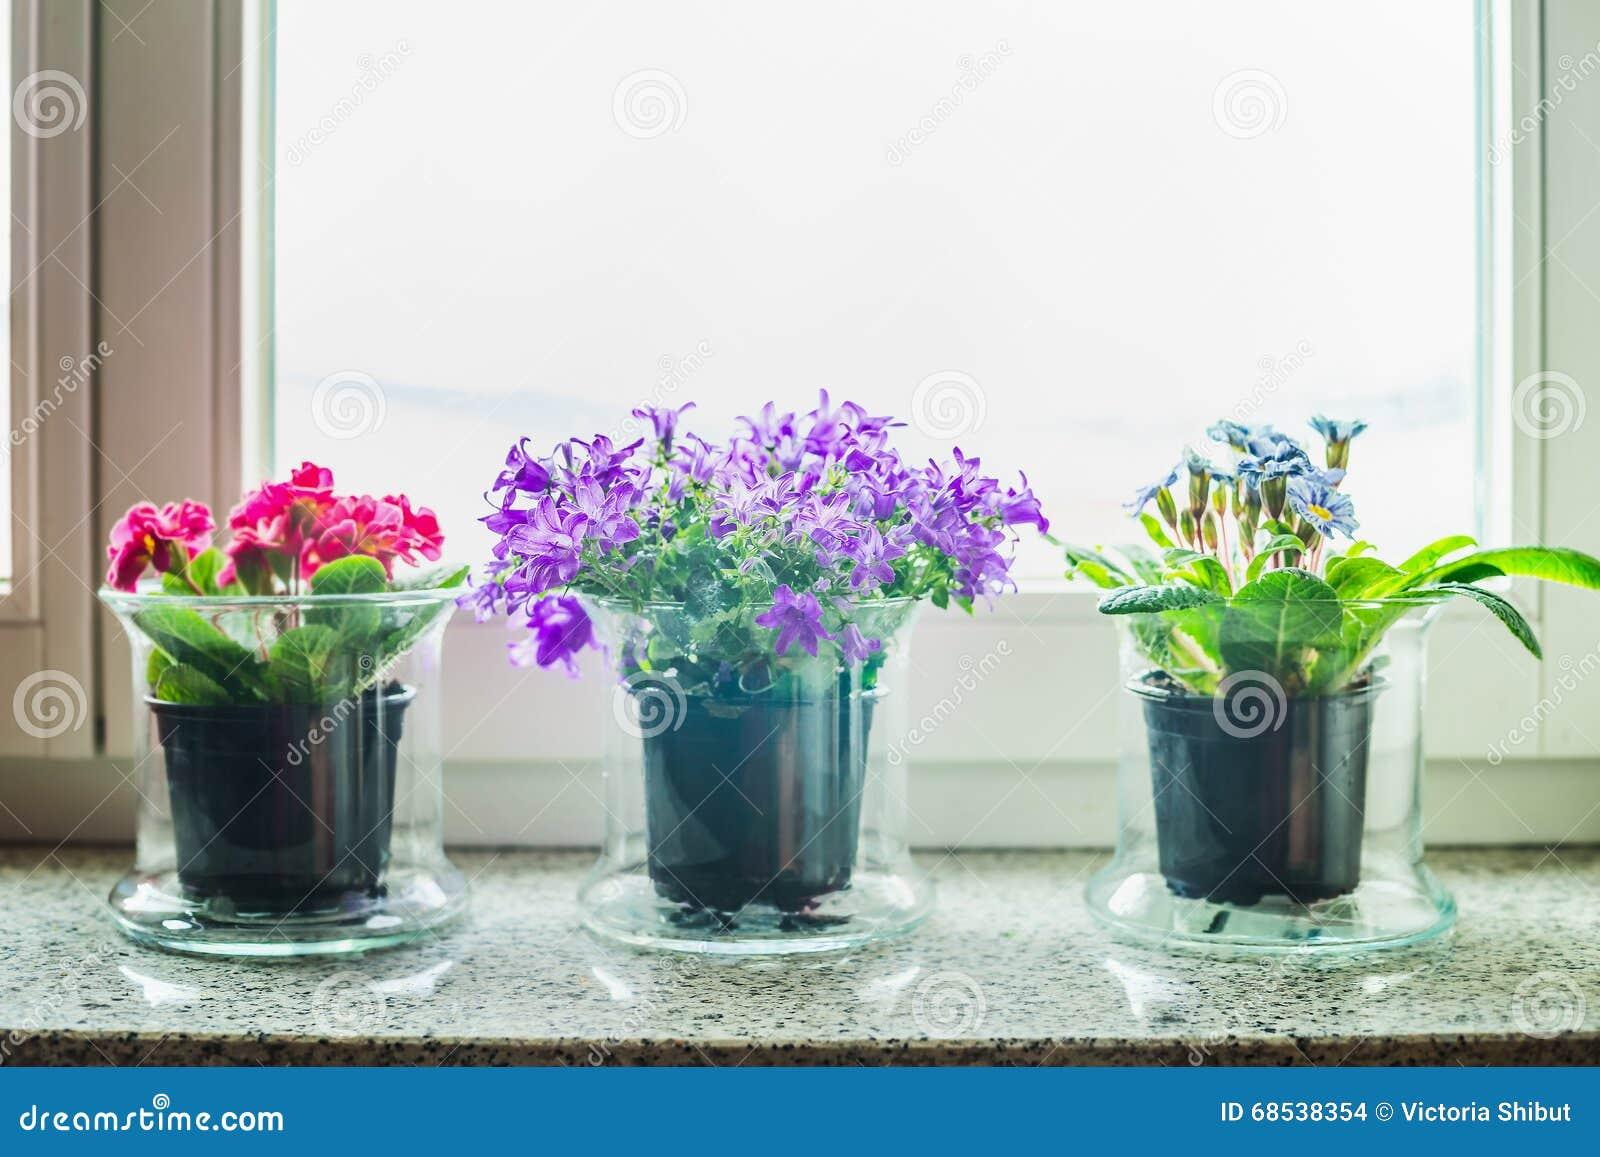 eeyore inspired hand painted flower pot decoration avec